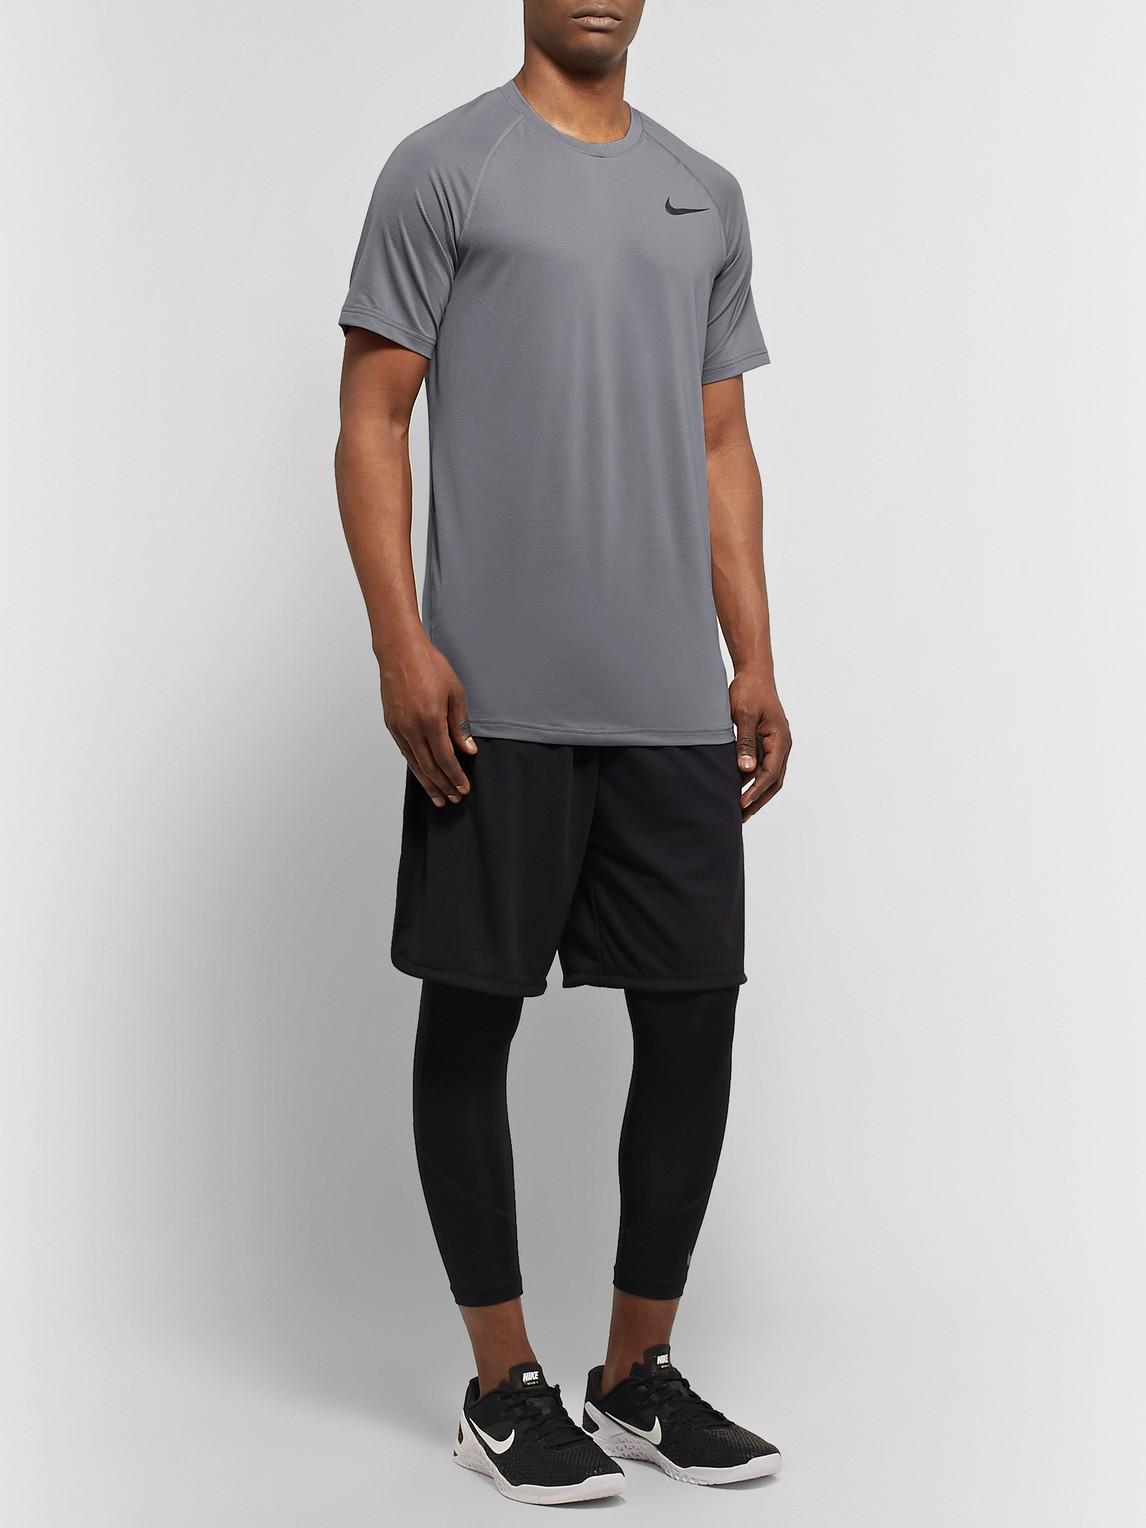 Nike Tops PRO SLIM